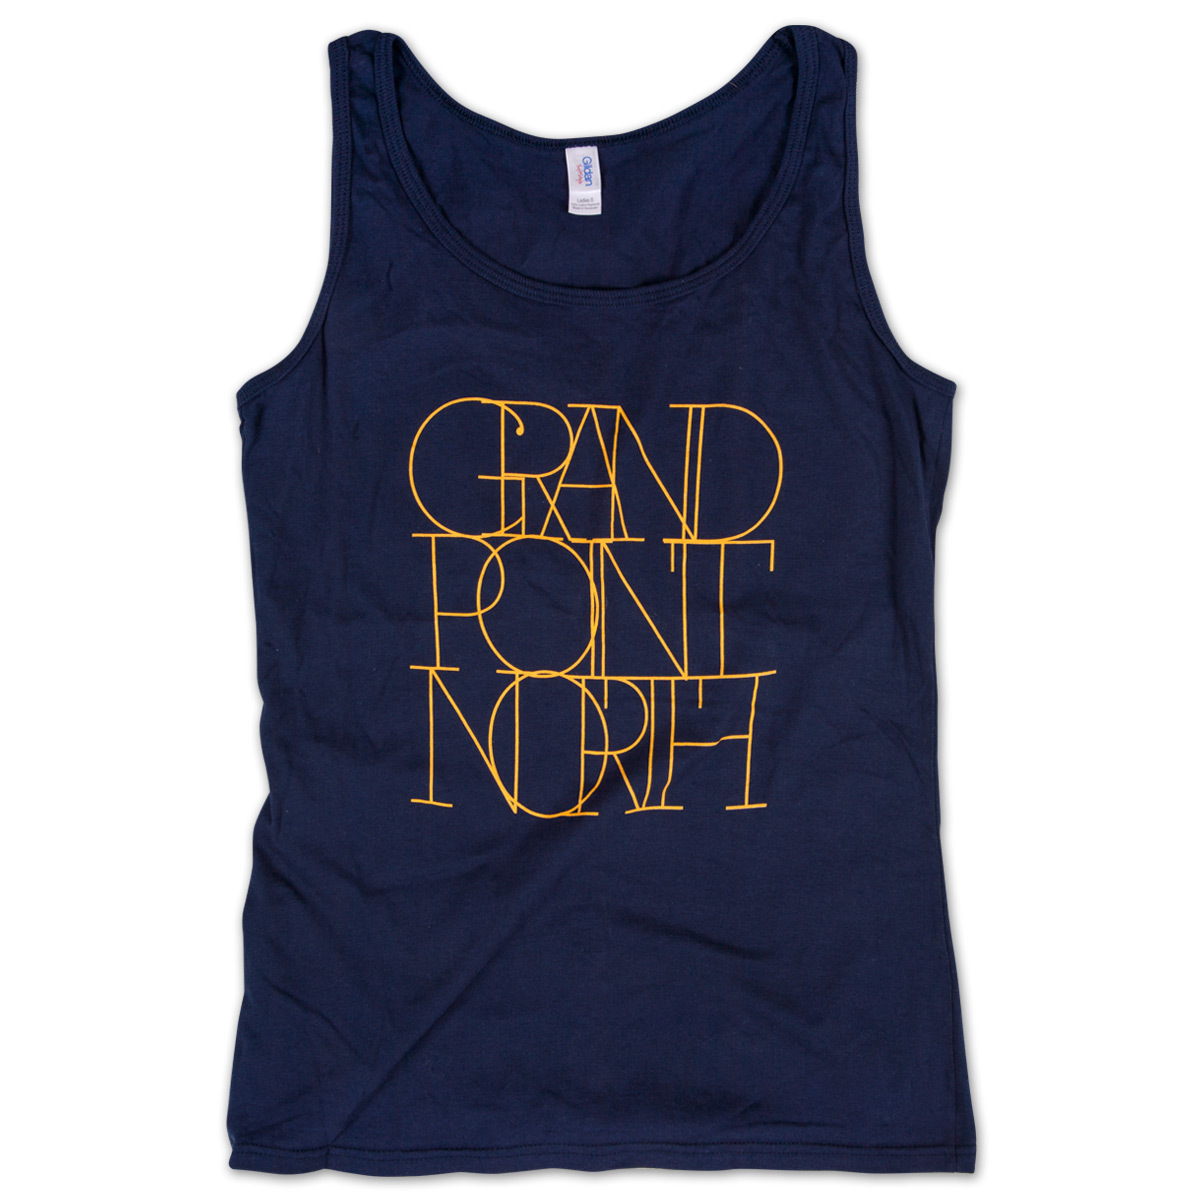 2012 Grand Point North Festival Women's Tank